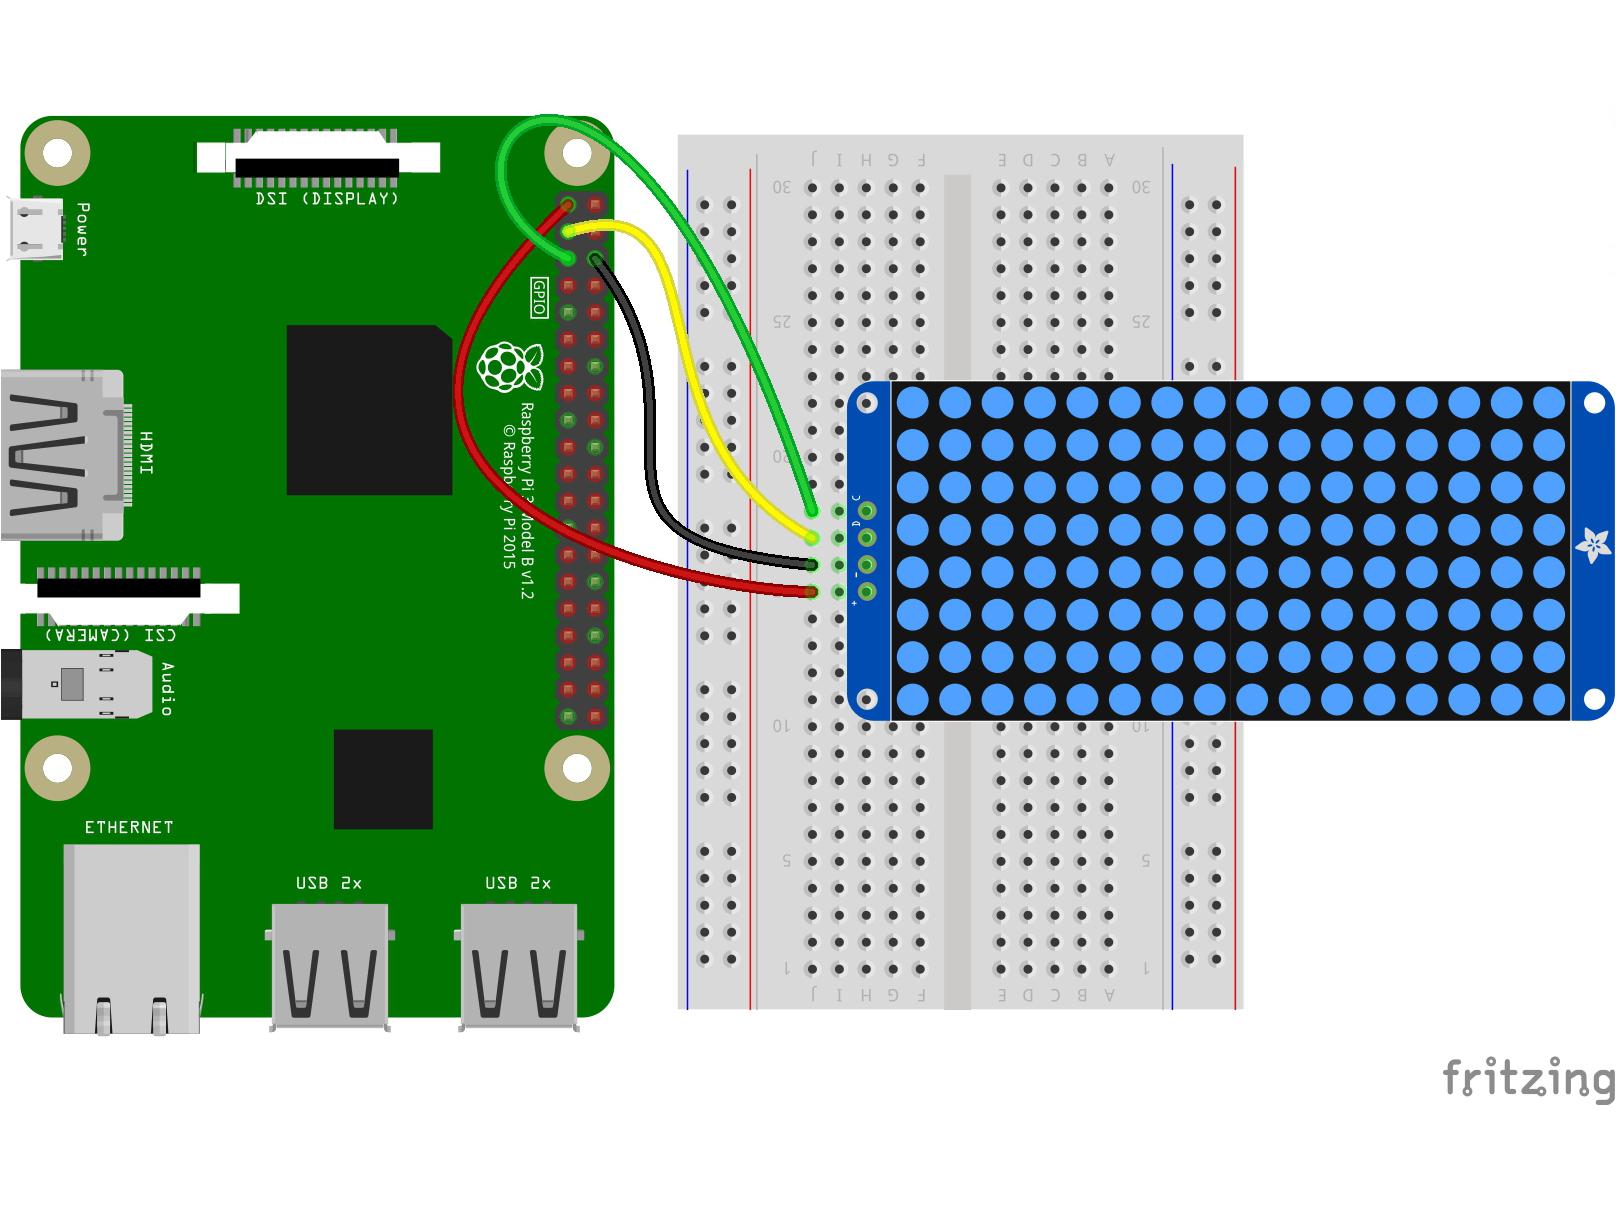 led_matrices_raspberry-pi-1.2-16x8_bb.jpg